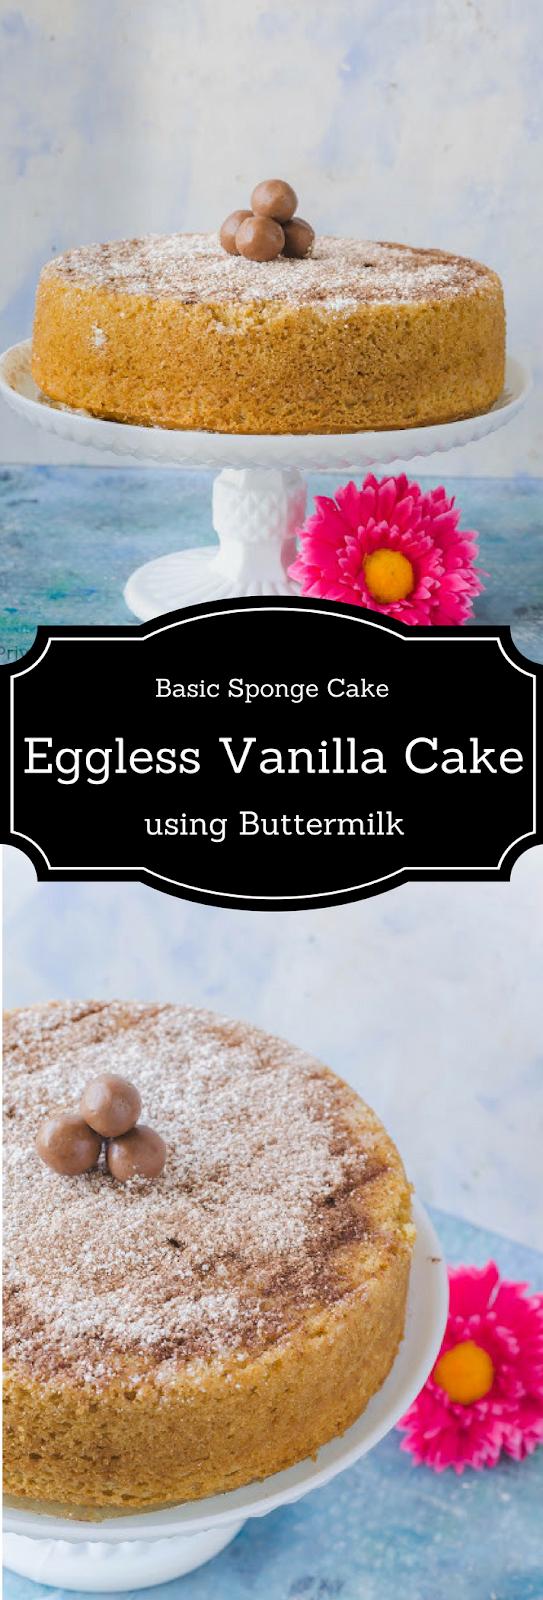 Eggless Vanilla Cake Recipe Using Buttermilk